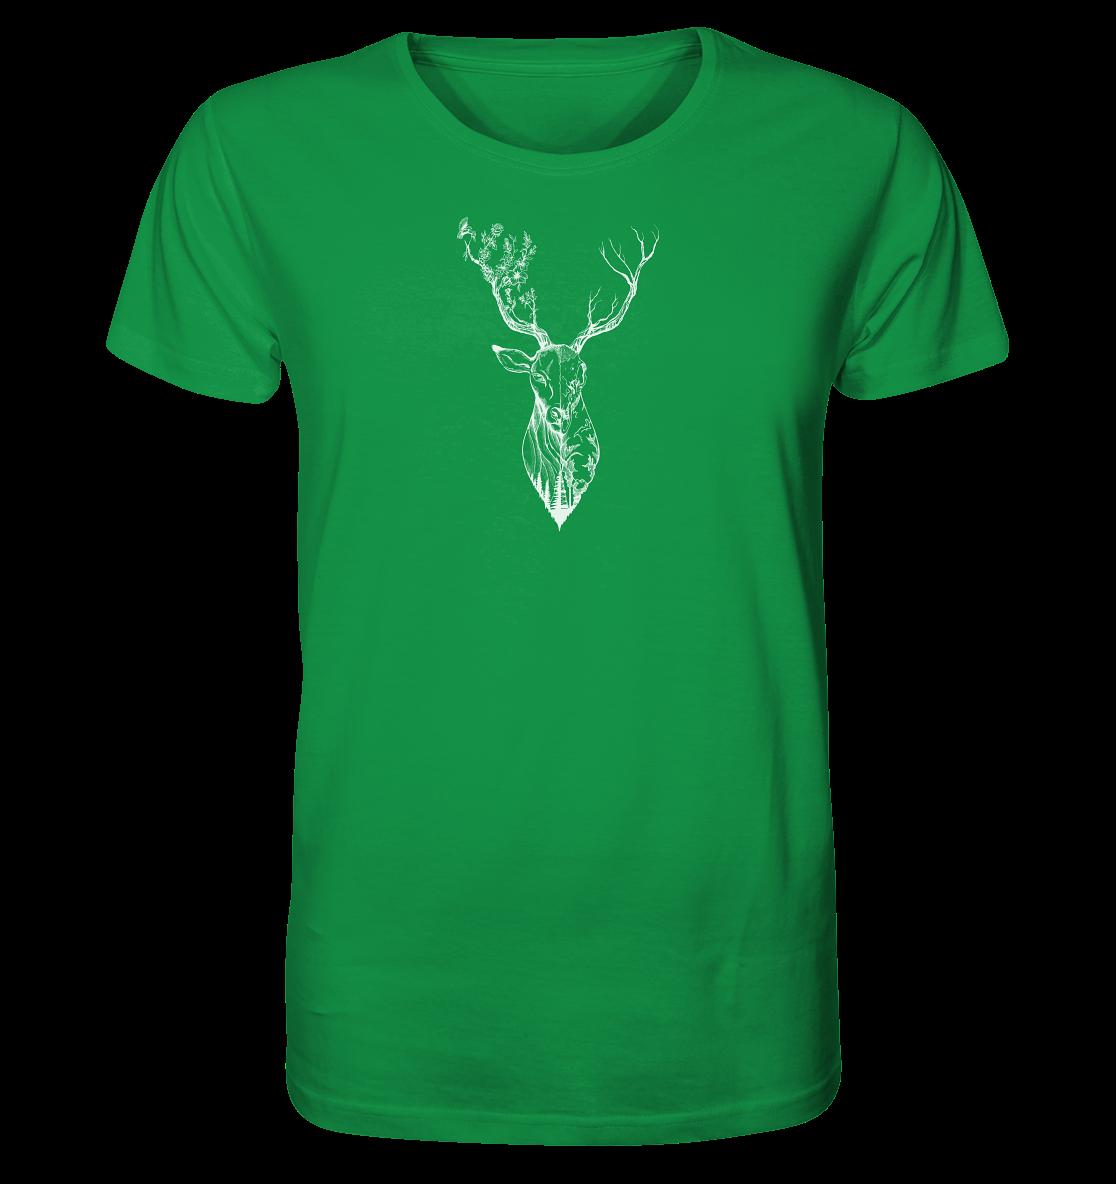 front-organic-shirt-149348-1116x-15.png